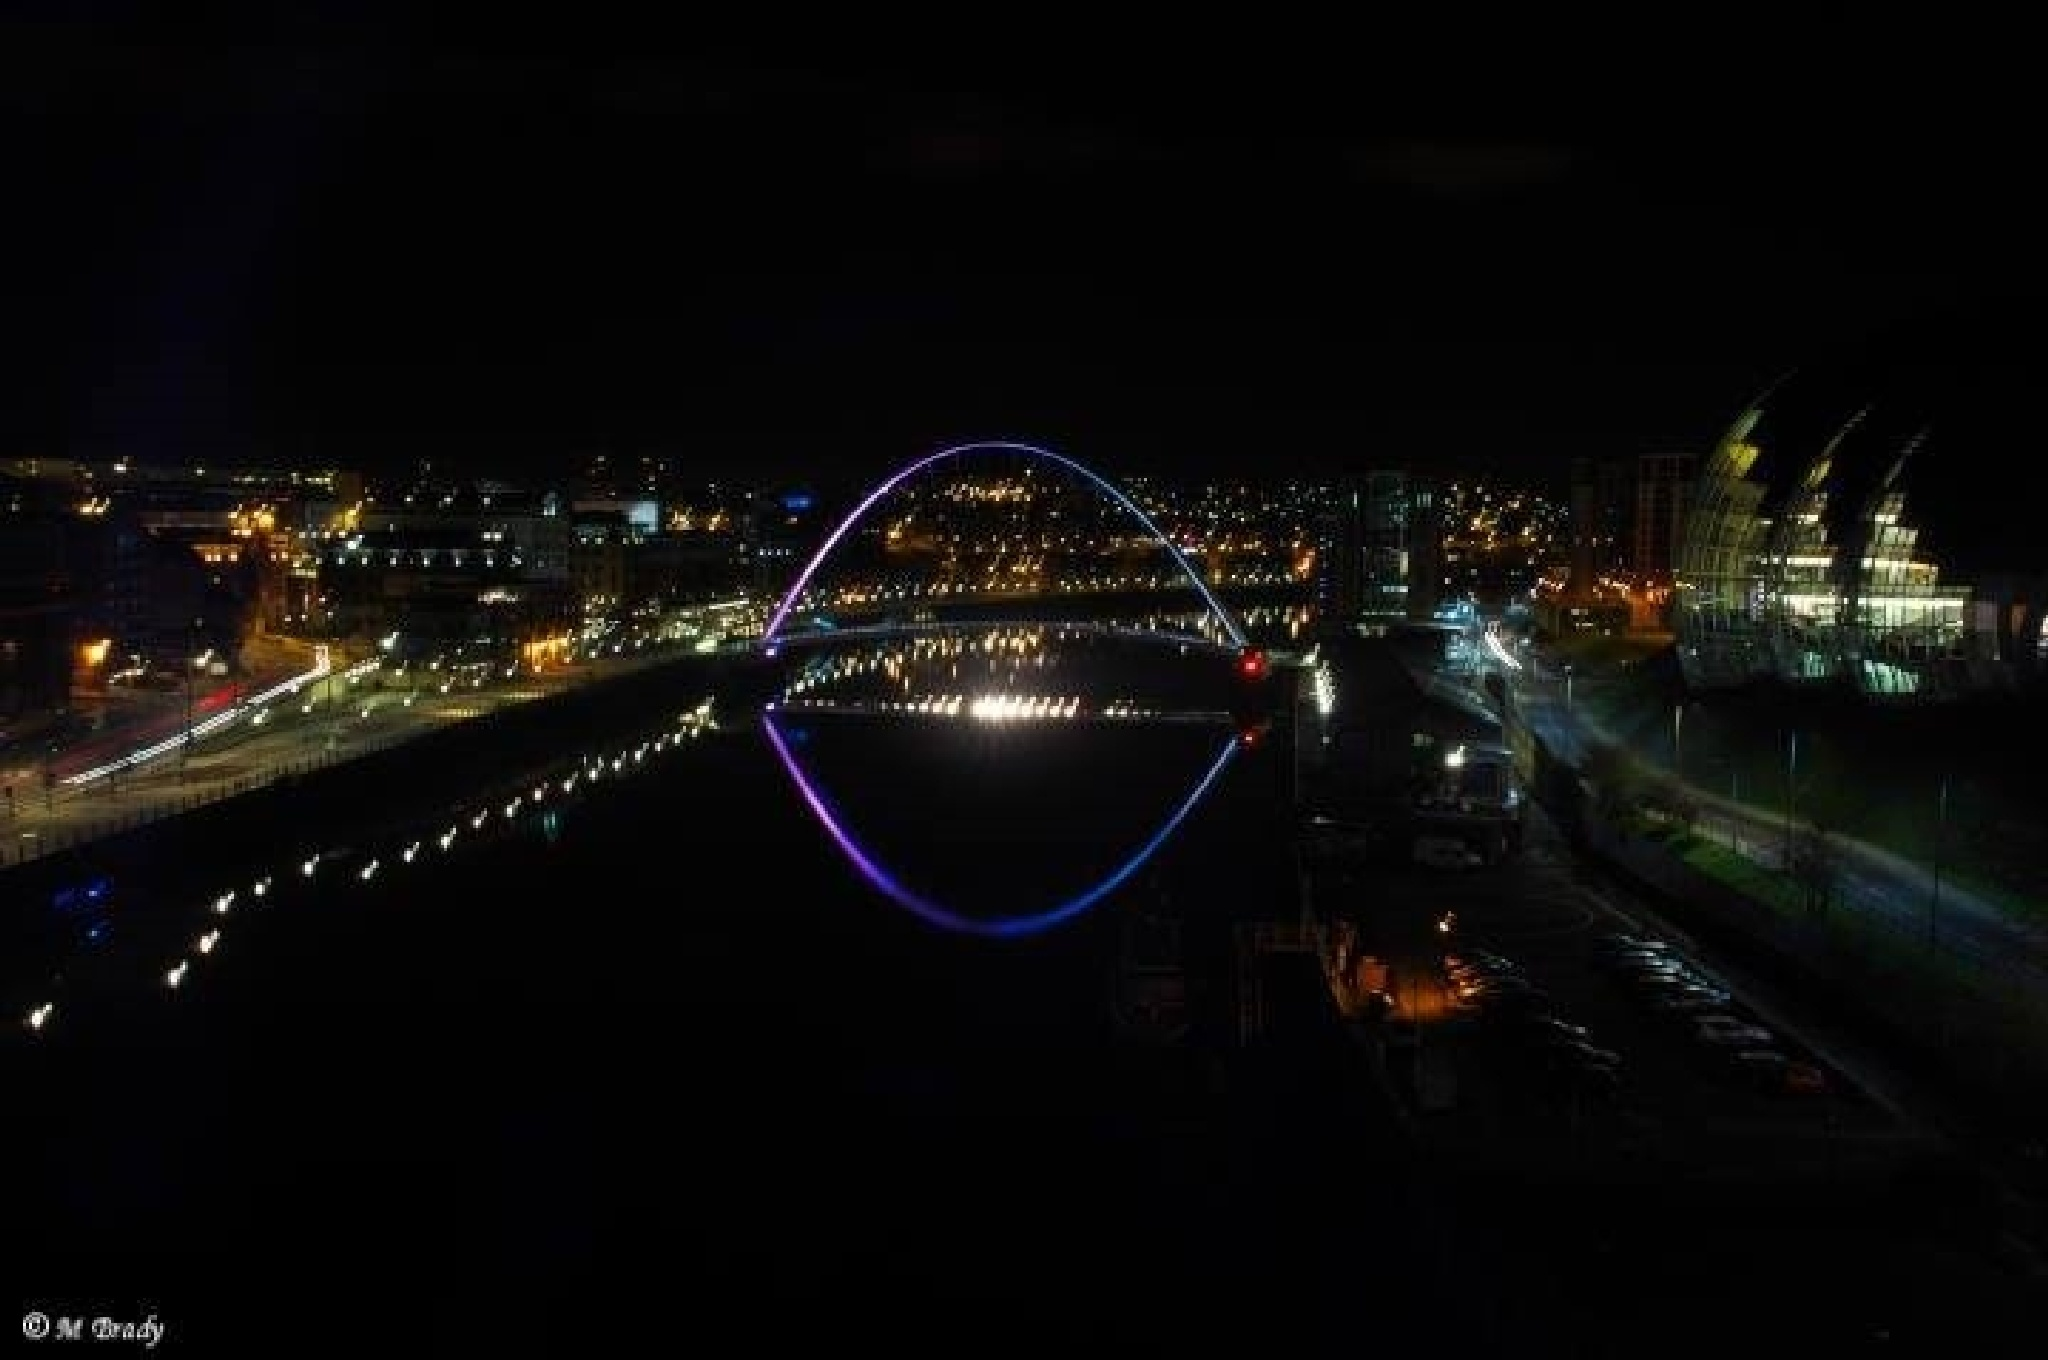 view from a bridge by Michael Brady